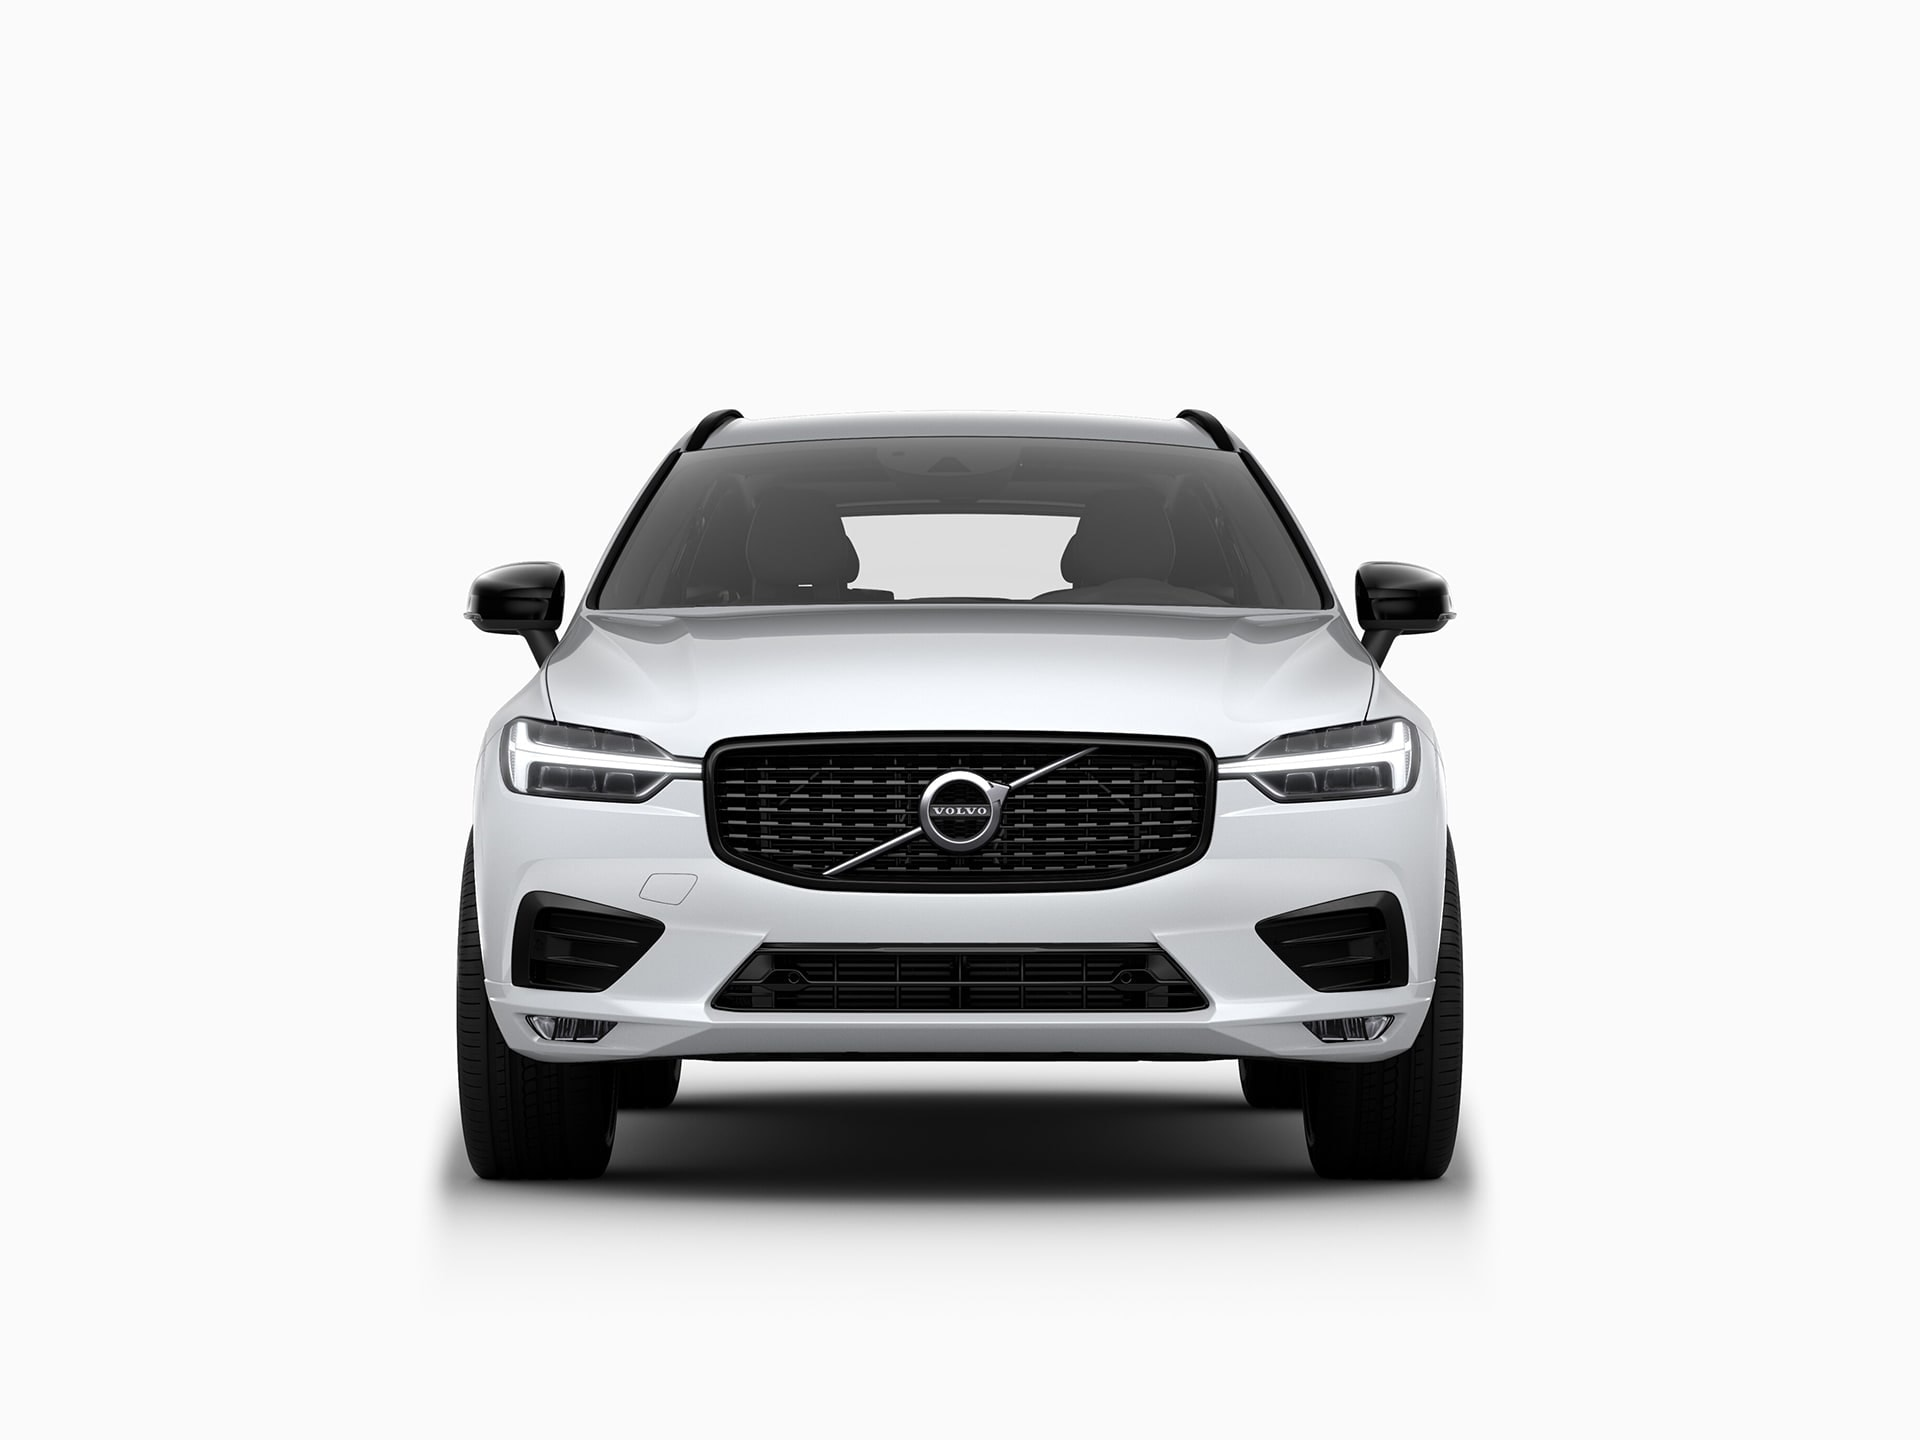 Volvo XC60 的正面。